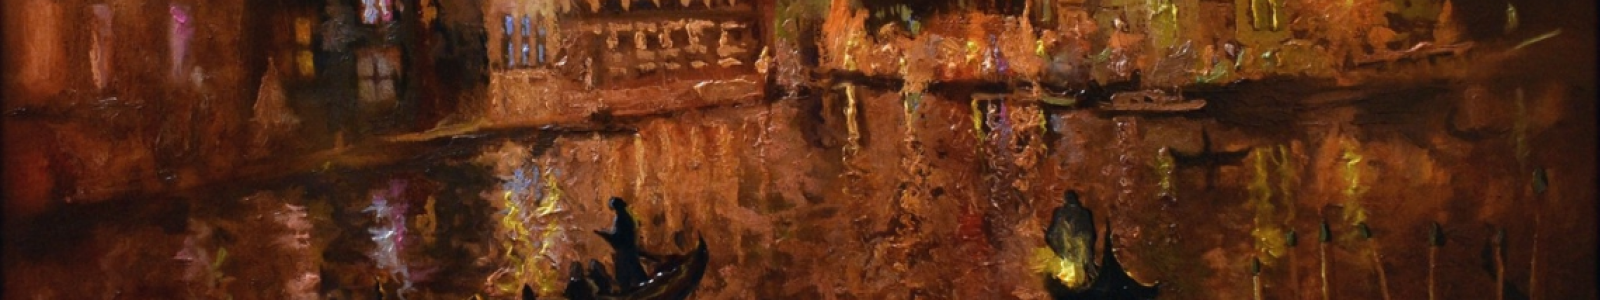 Gallery Painter Vladimir Vorontsov